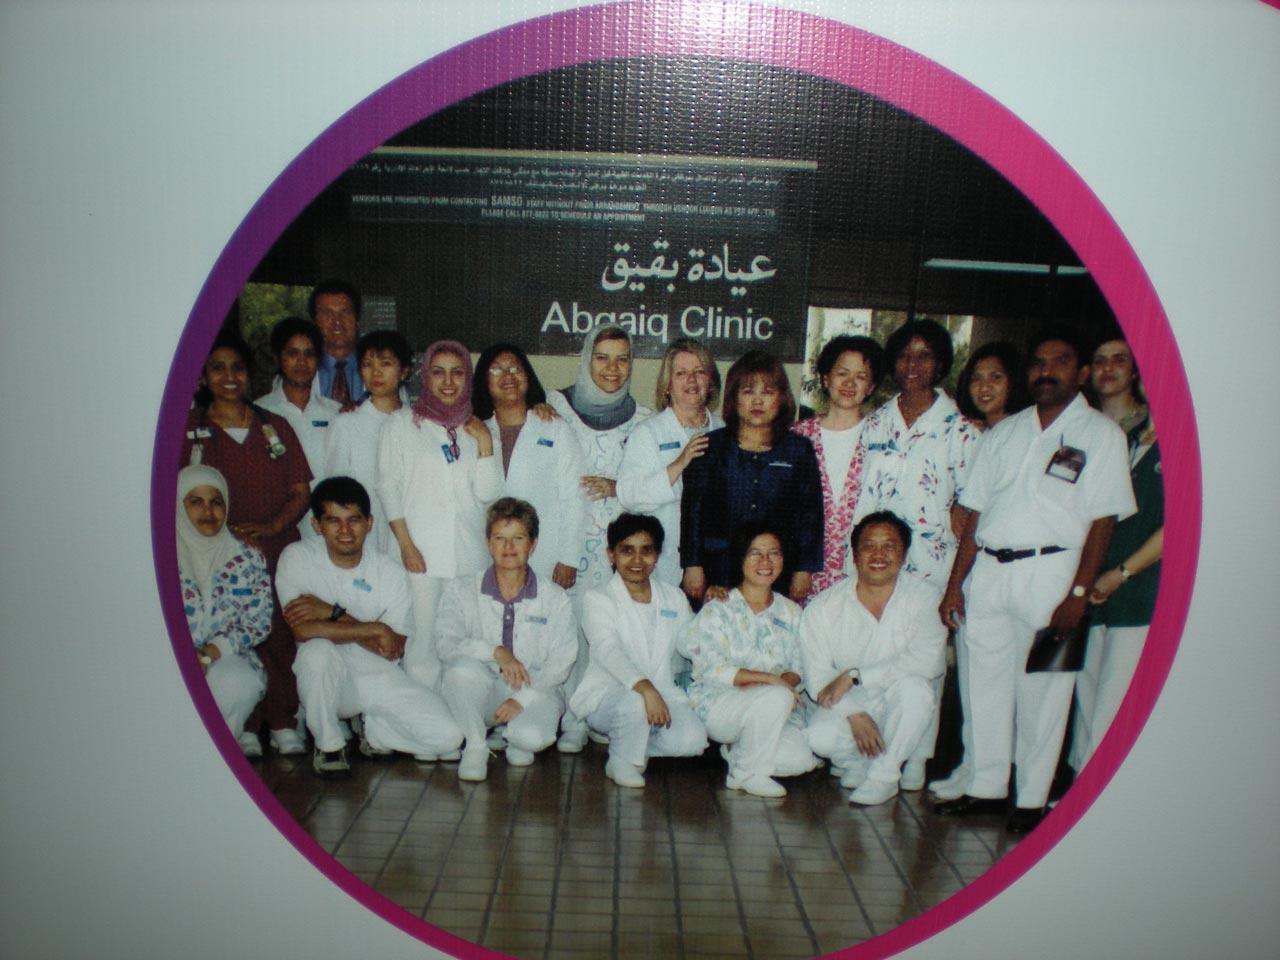 Abqaiq Clinic Nurses